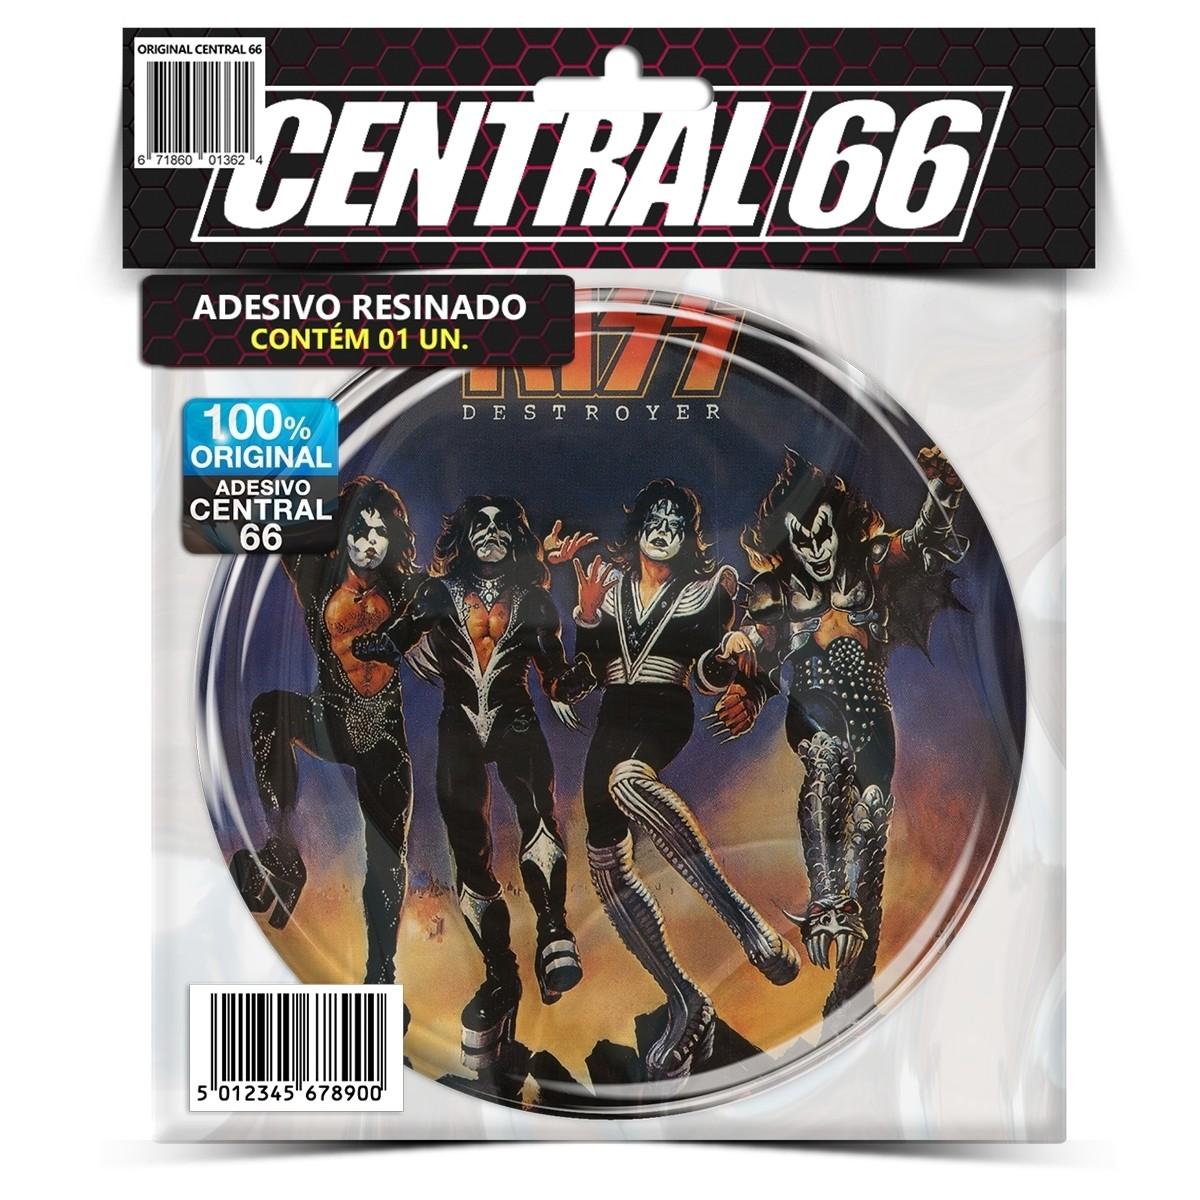 Adesivo Redondo Kiss Destroyer – Central 66